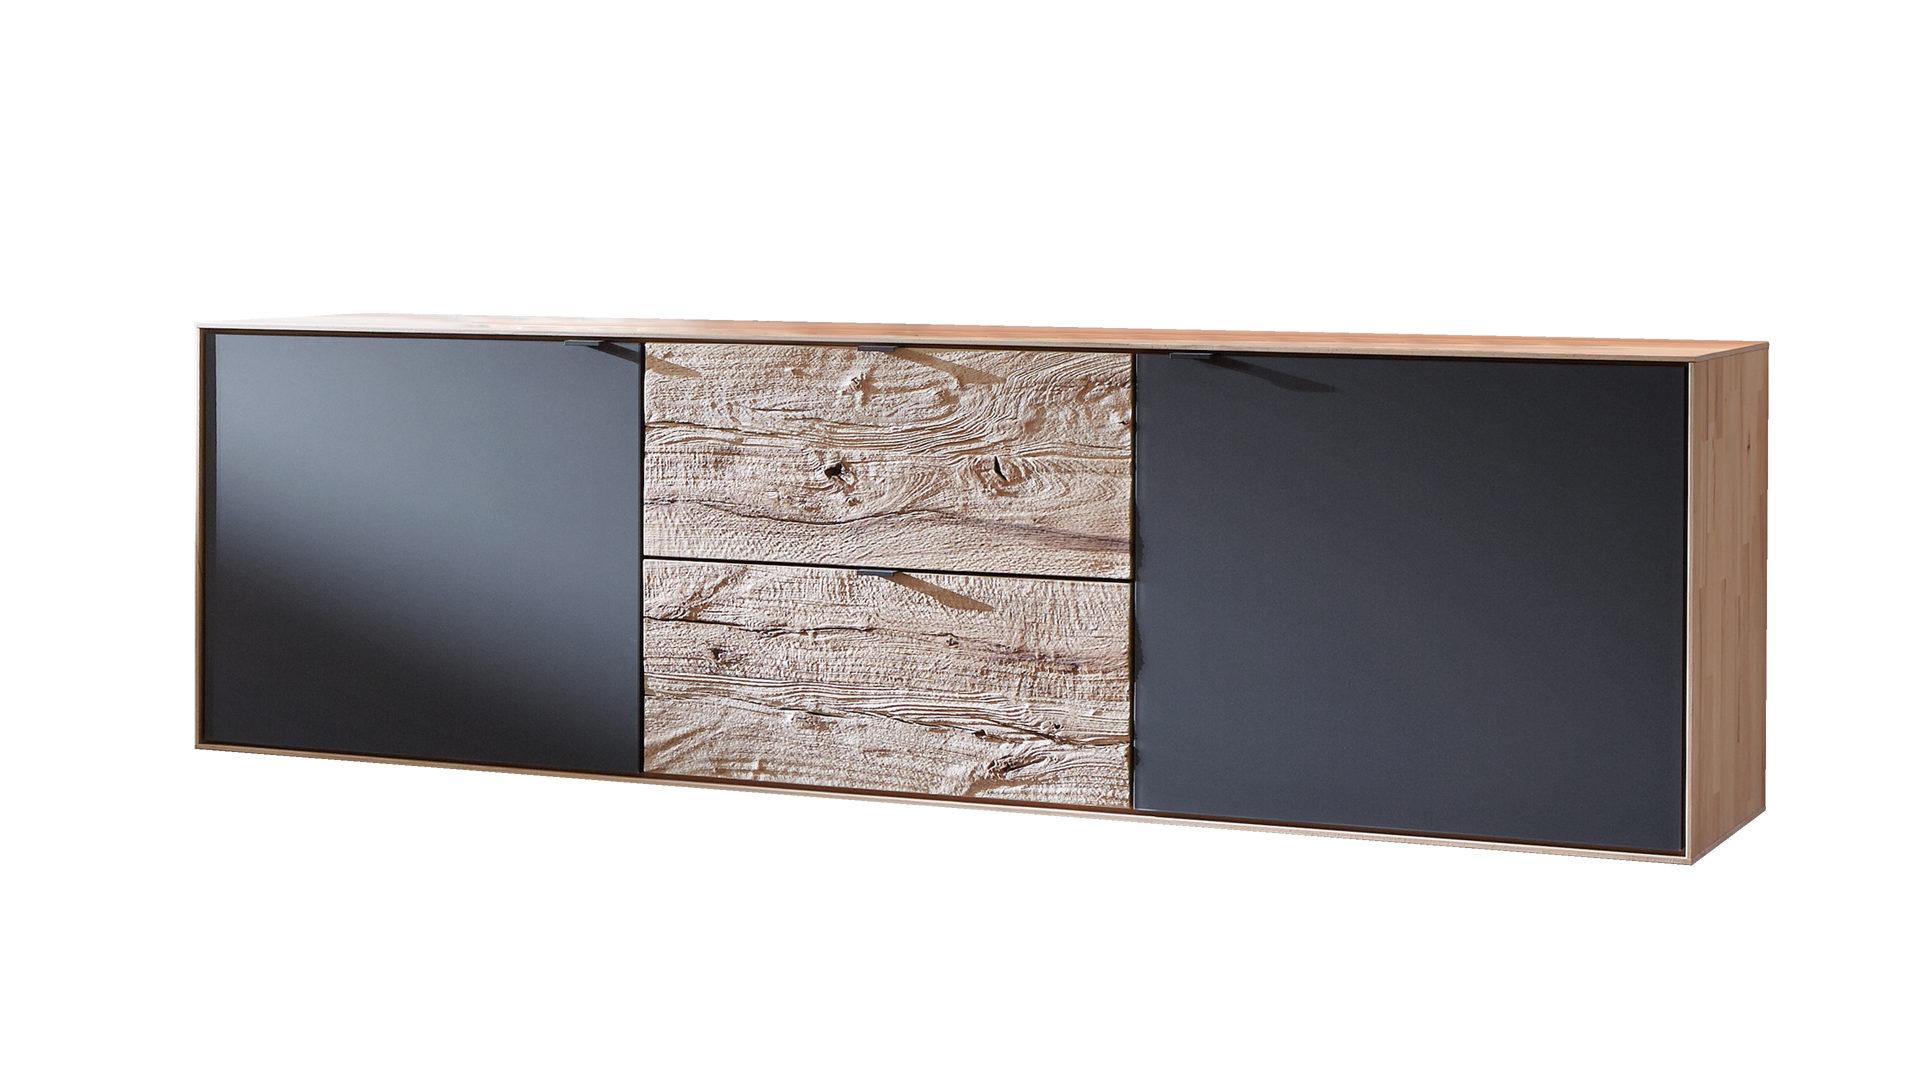 Sideboard holz hell  Hertel Möbel e.K. Gesees, Räume, Wohnzimmer, Kommoden + Sideboards ...